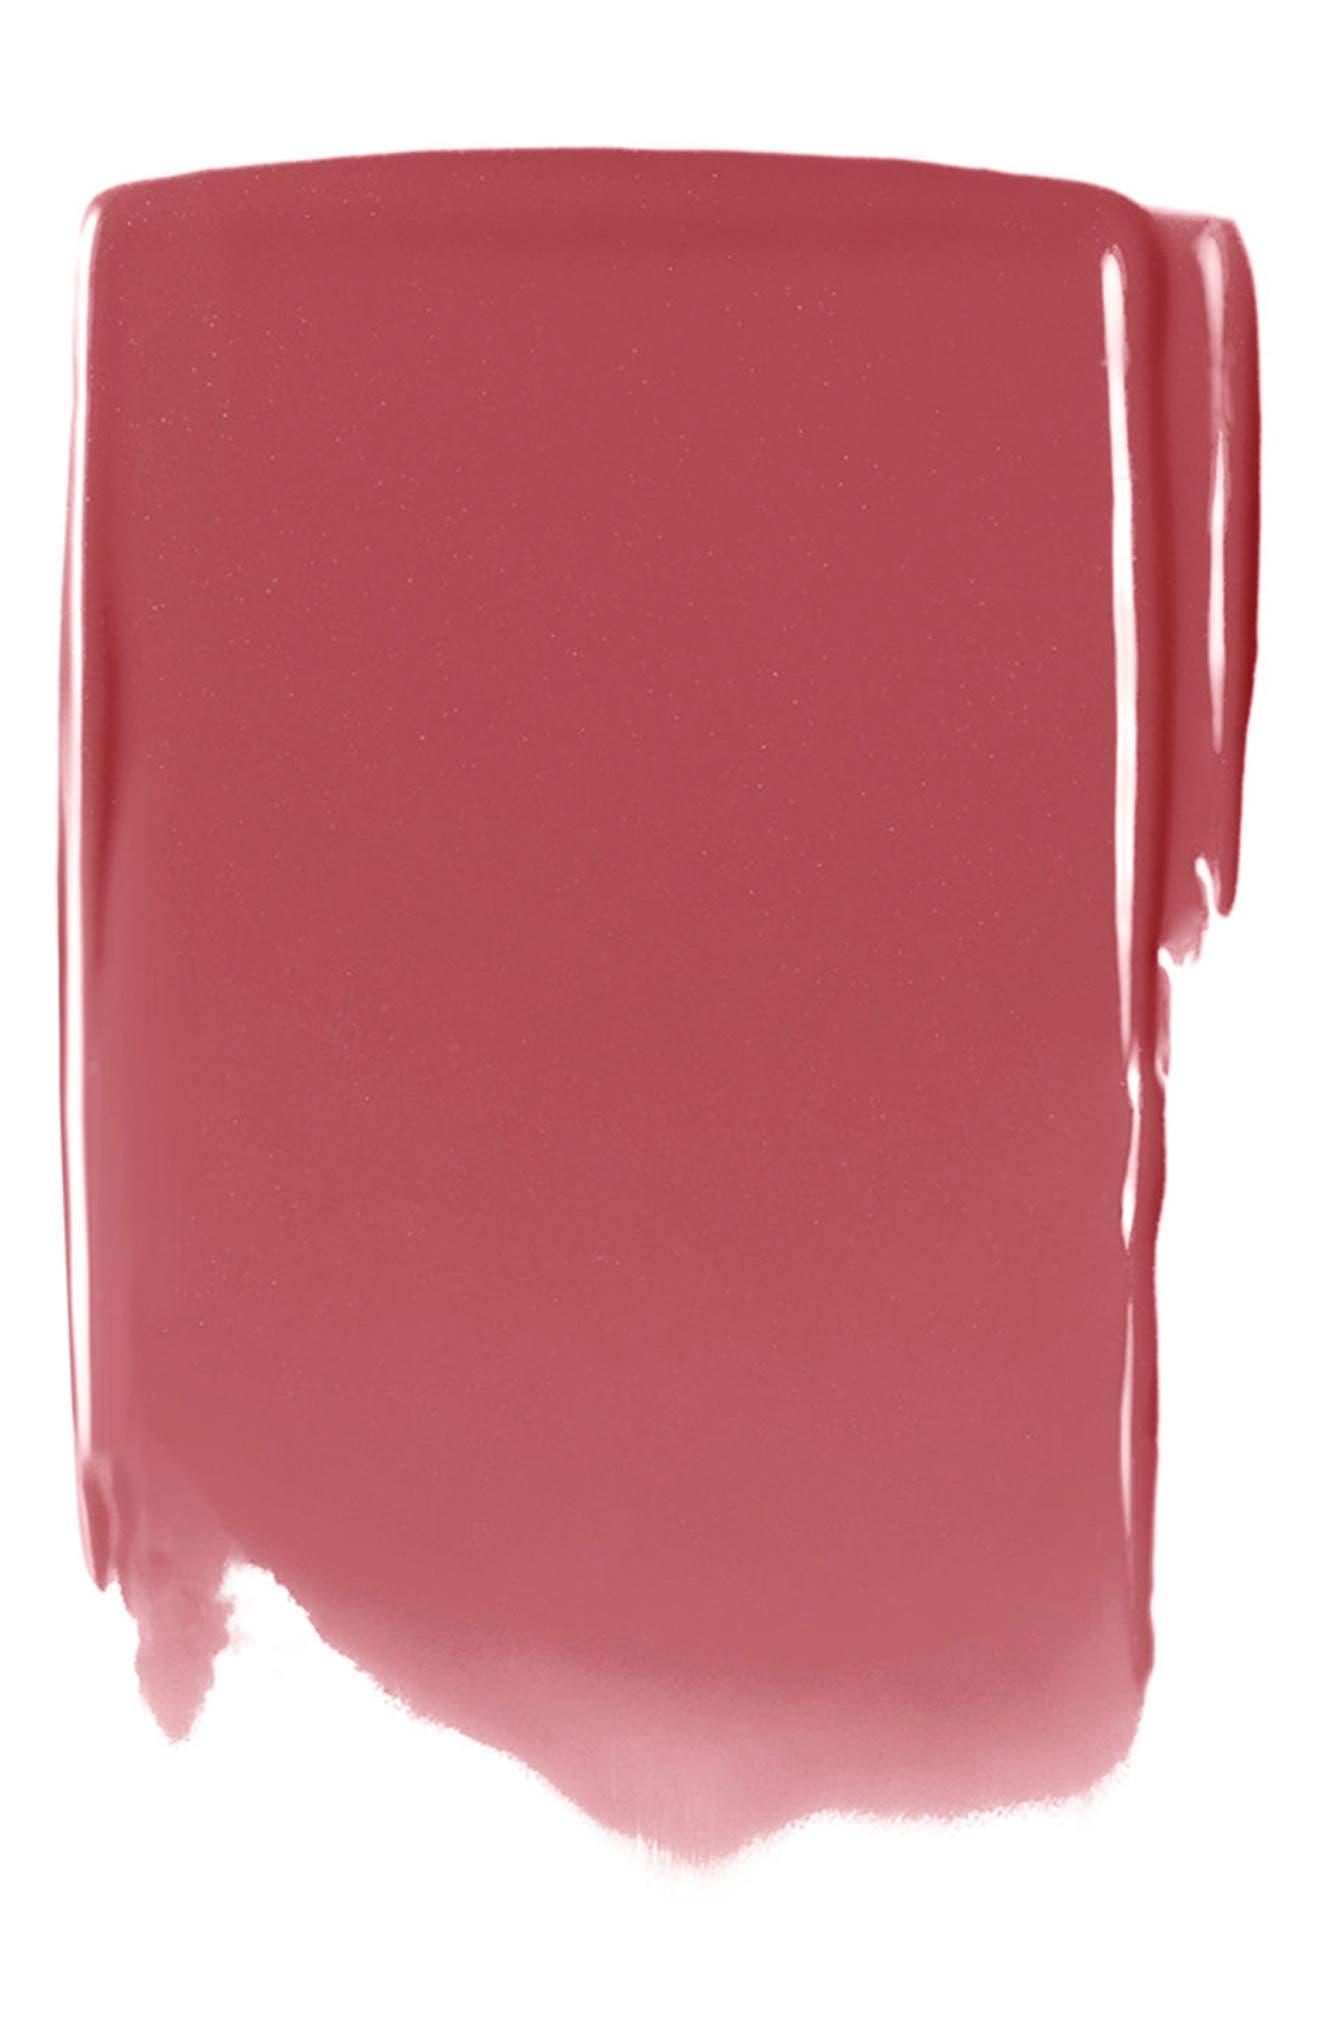 Undressed Liquid Lip Set I,                             Alternate thumbnail 10, color,                             000